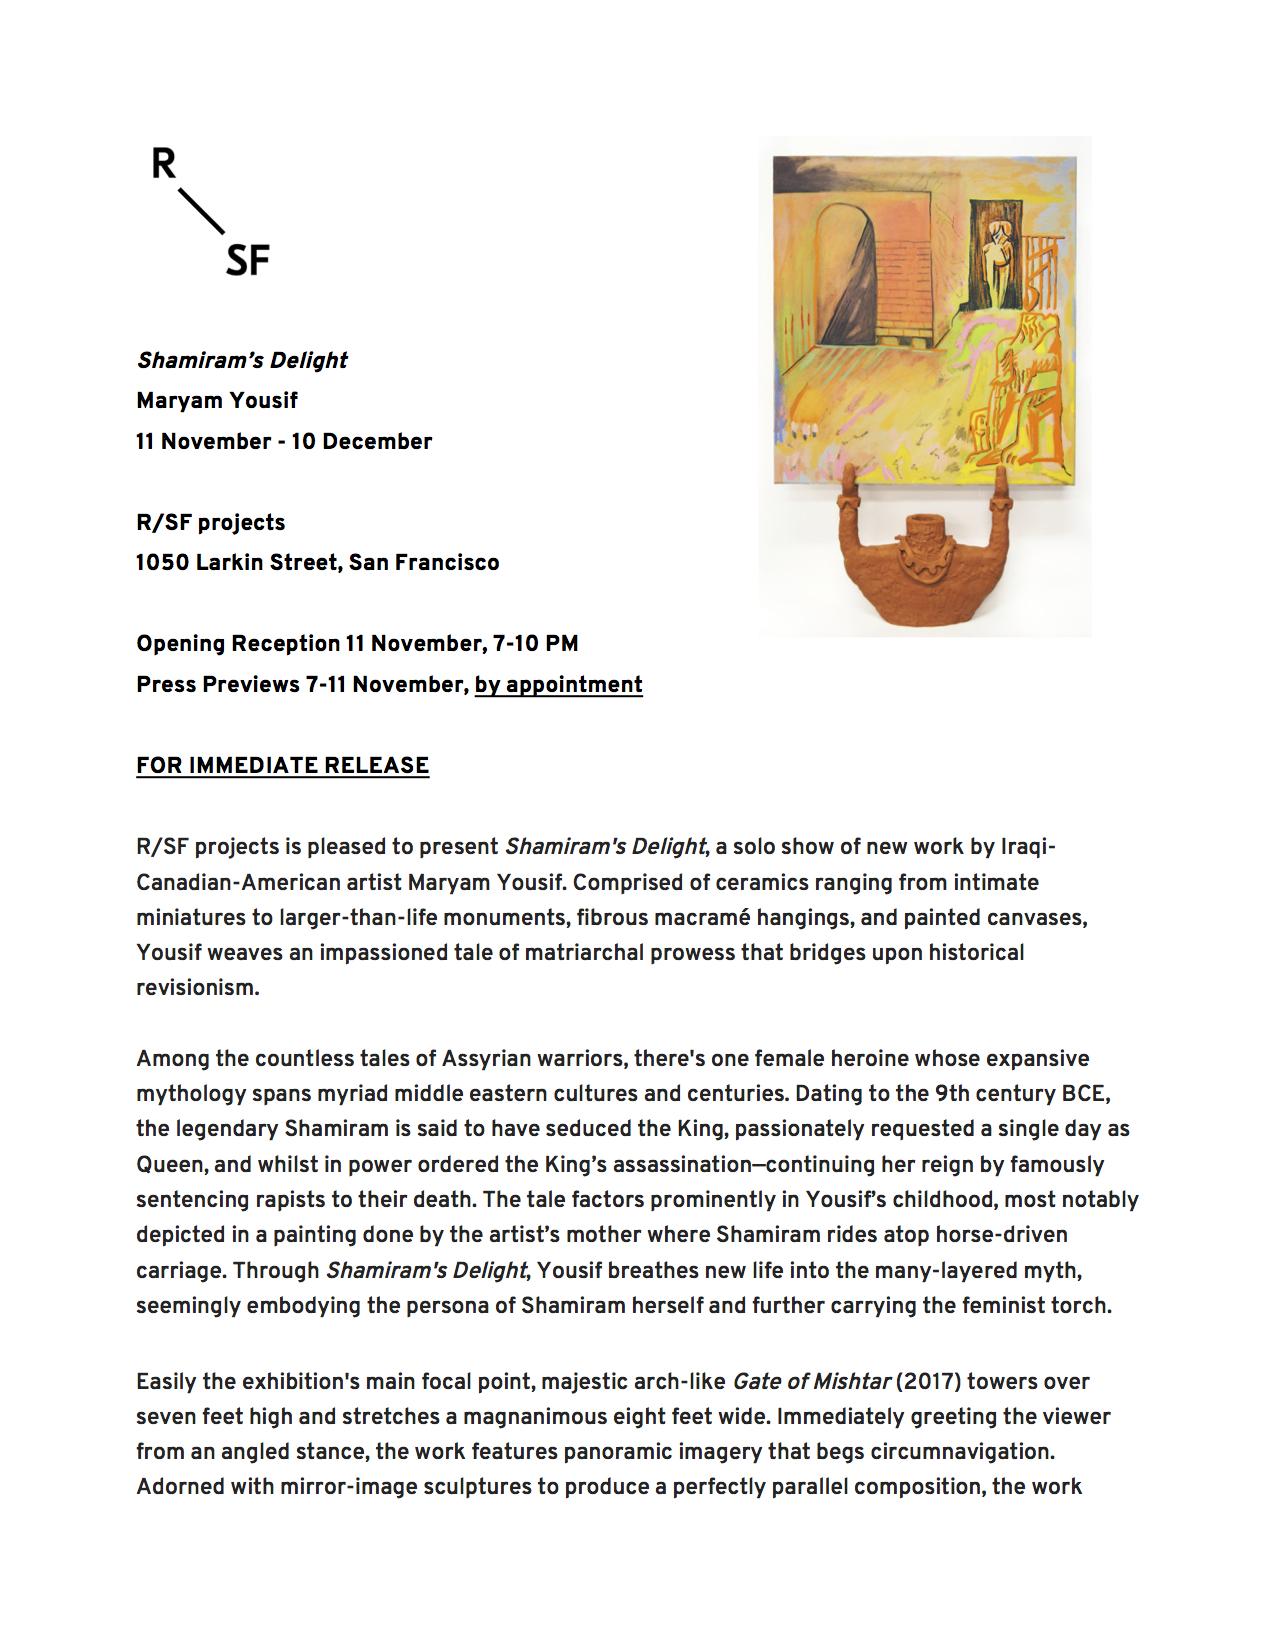 MaryamYousif_Press Release copy.jpg